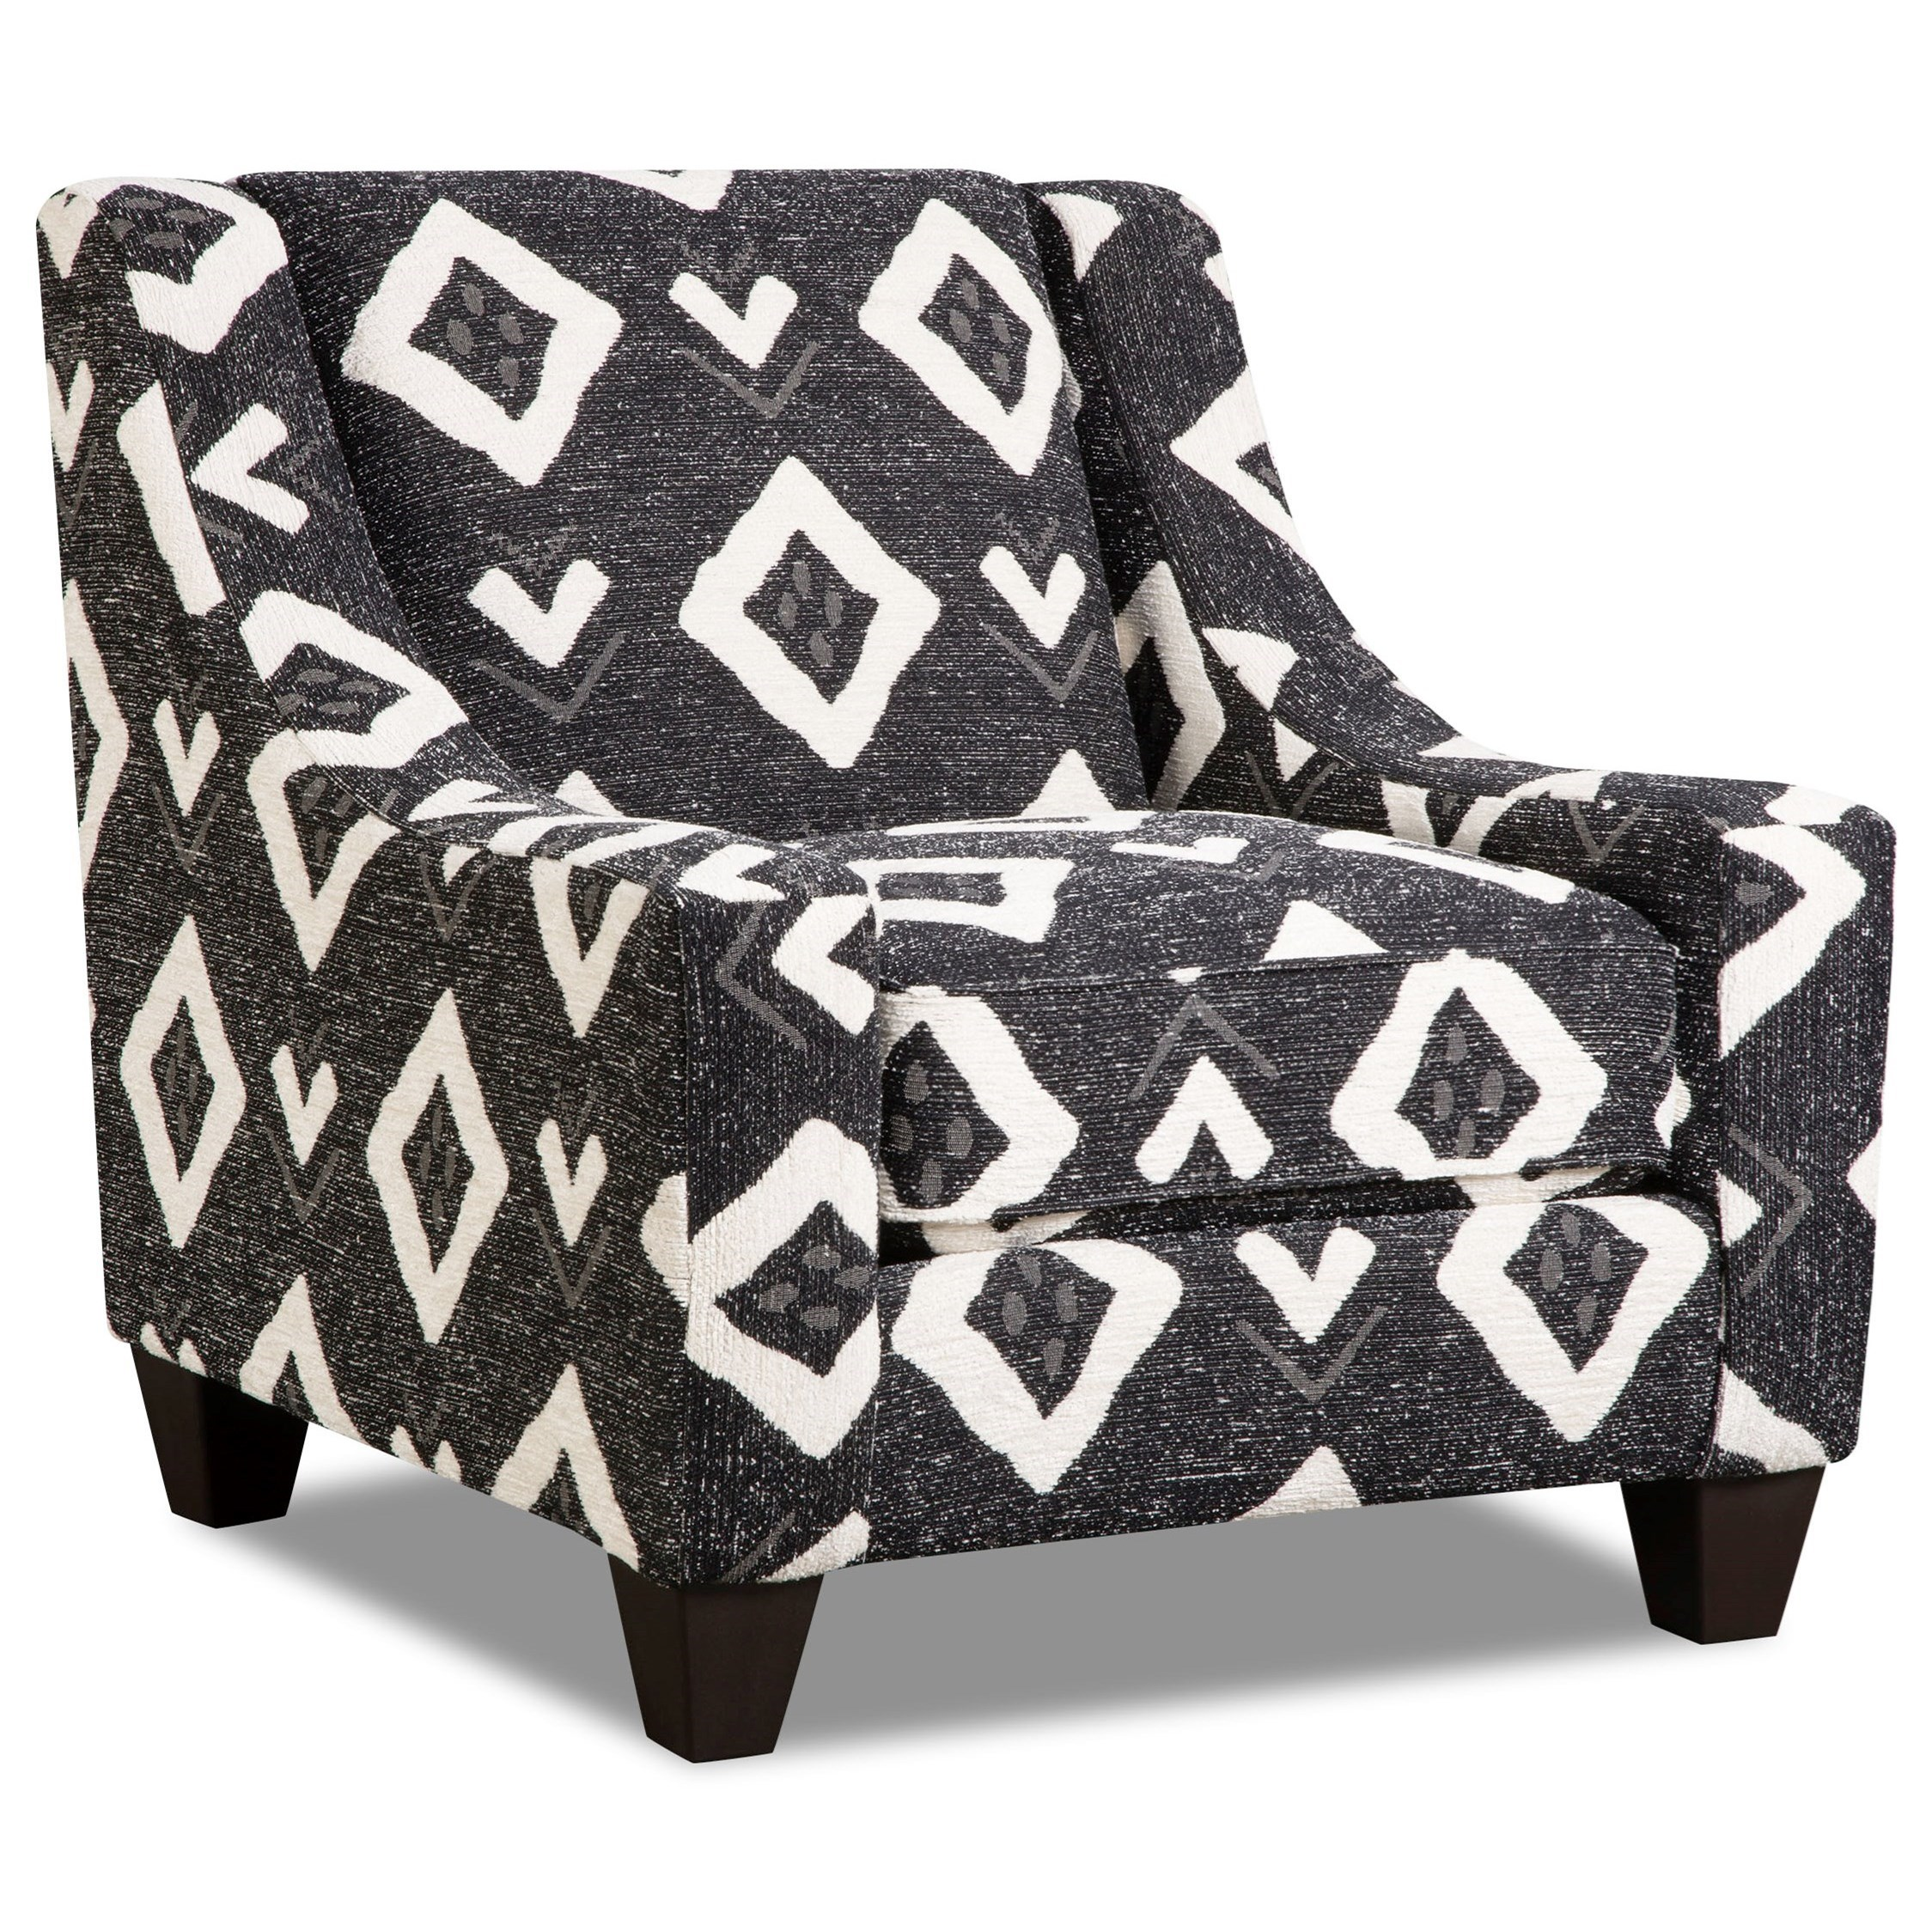 Corinthian Paradigm Carbon Accent Chair - Item Number: AC2062-Yuban-Tuxedo